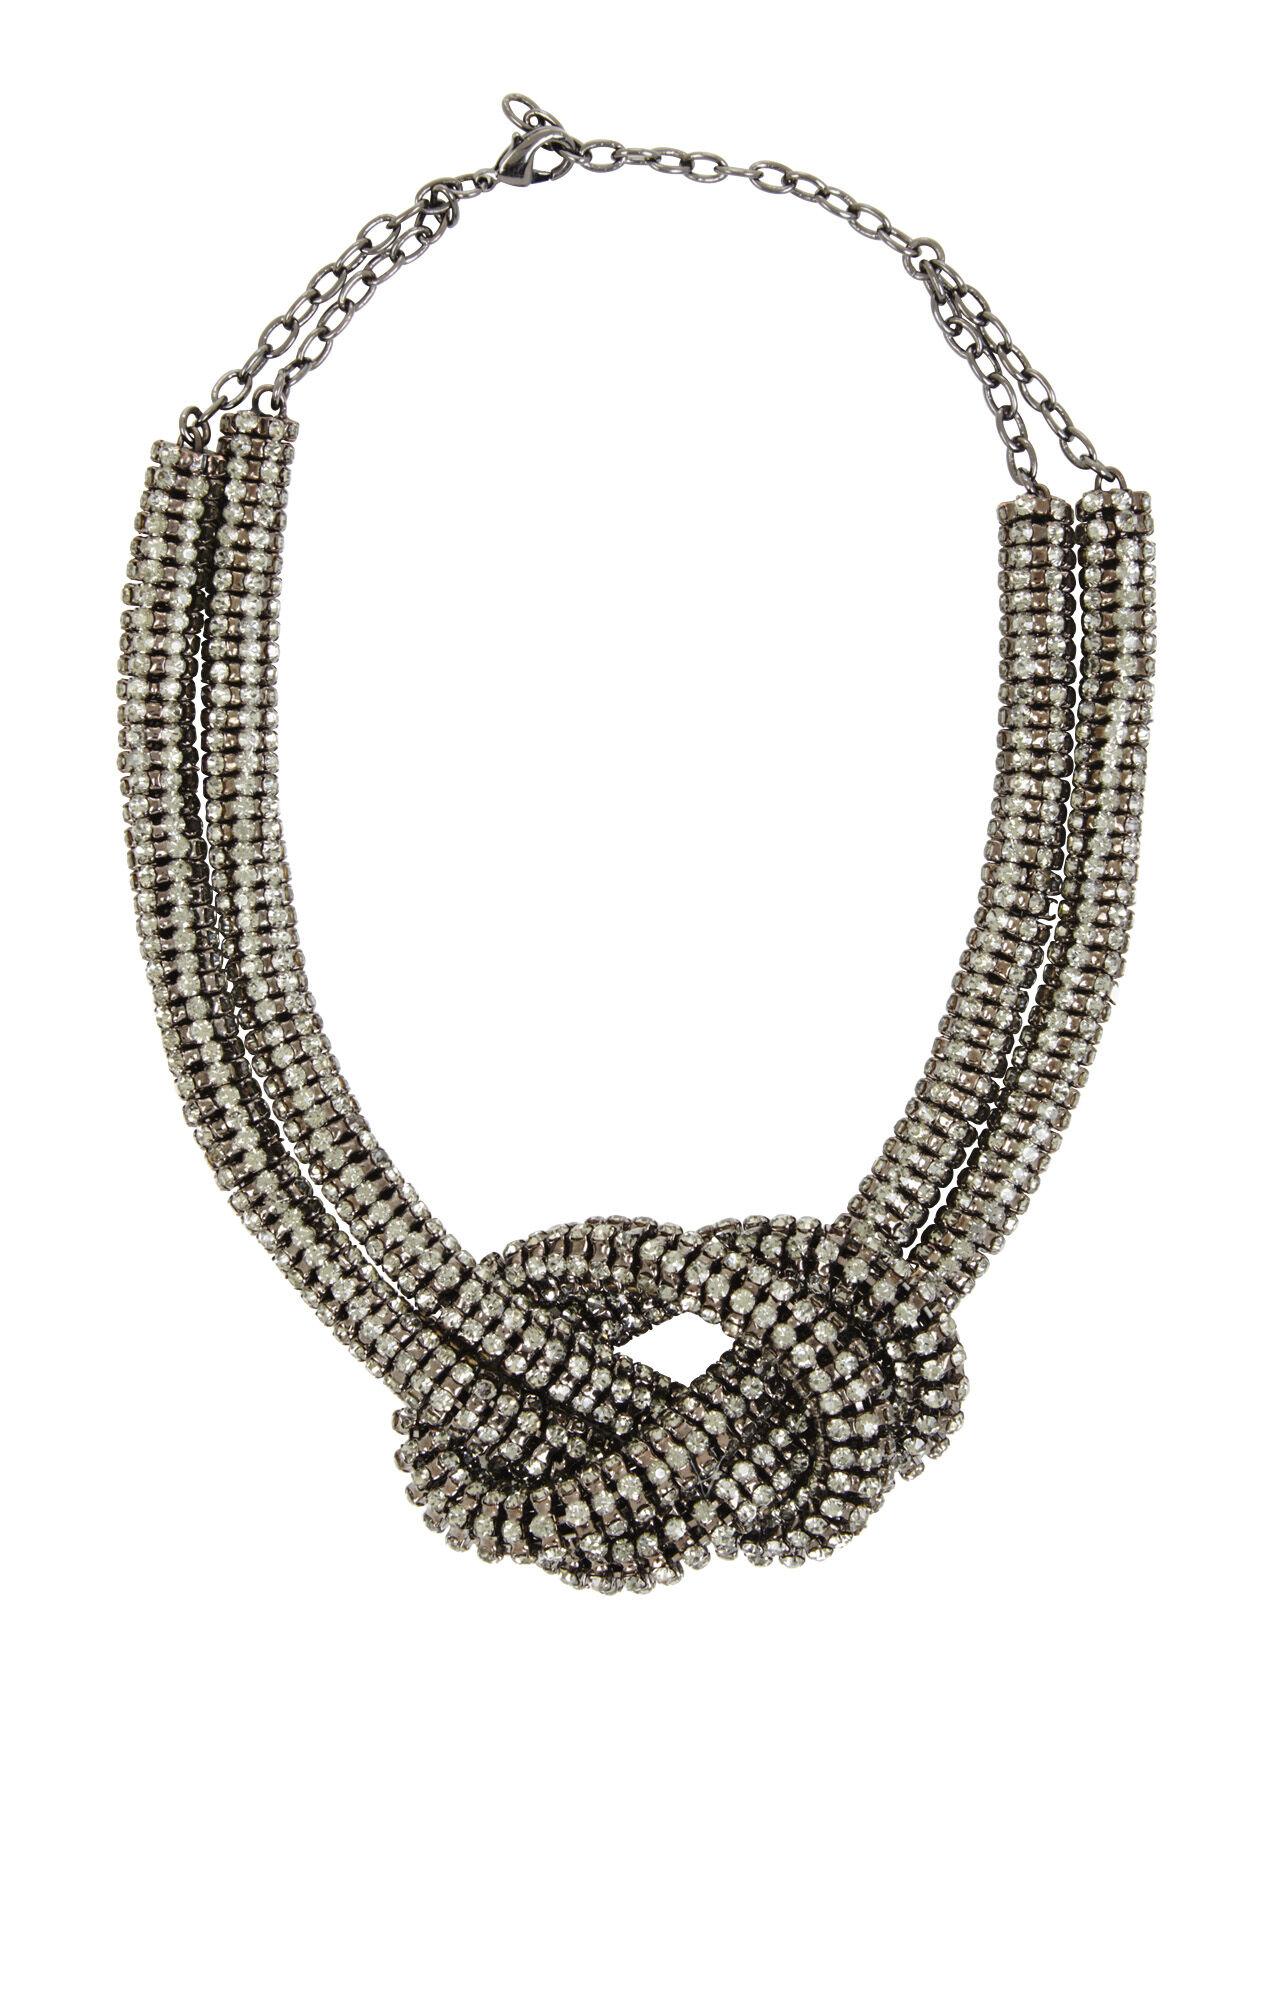 Rhinestone Knot Necklace